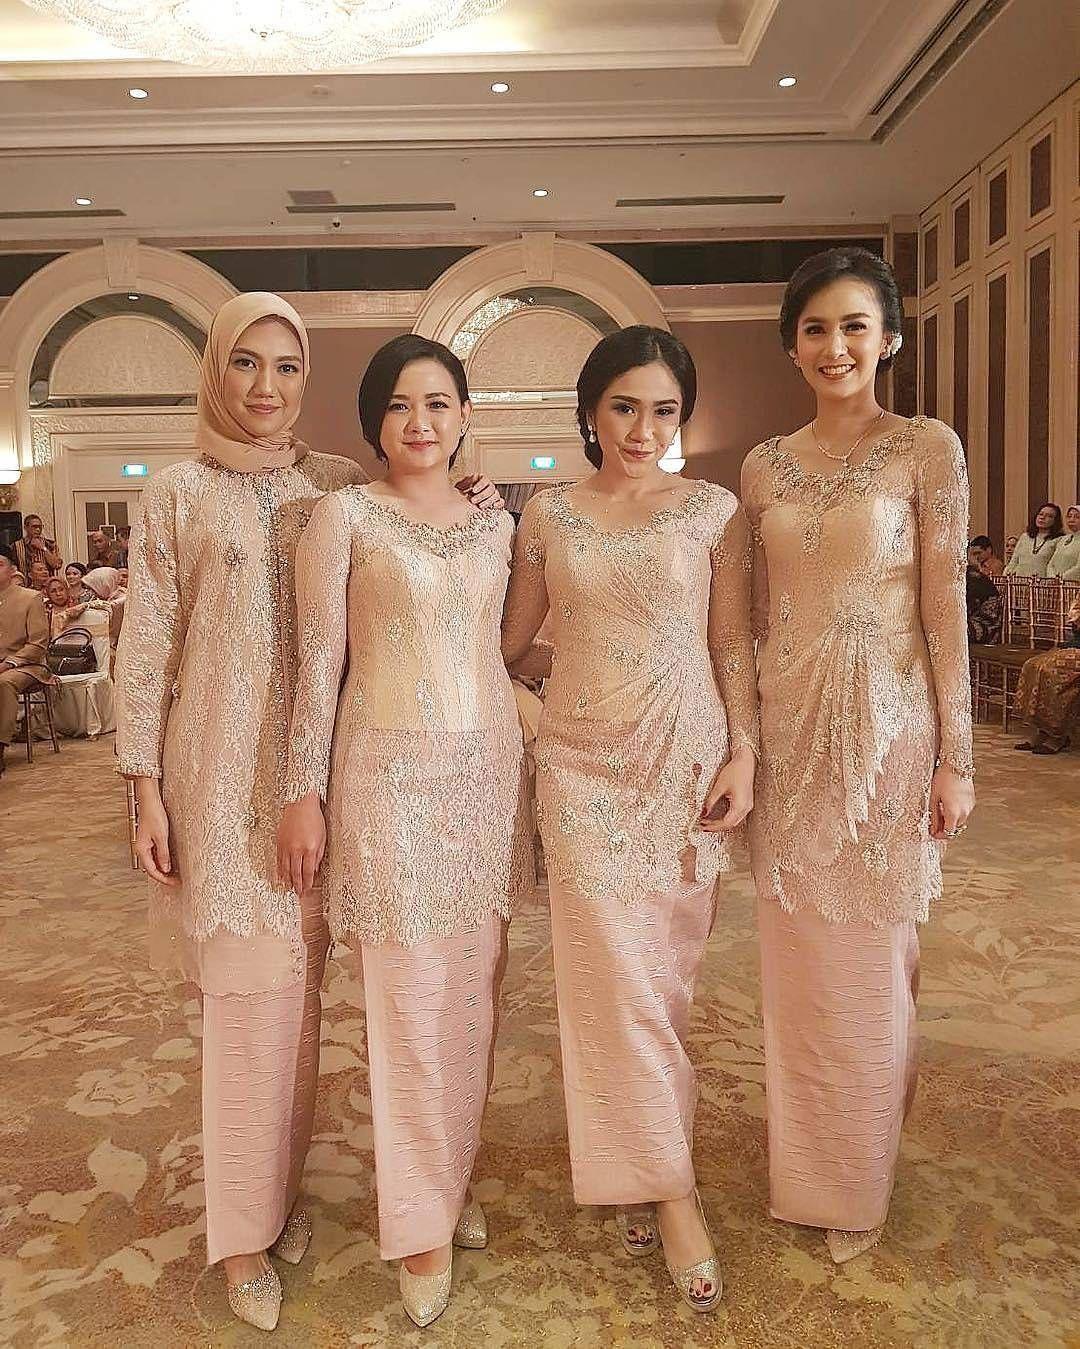 786 Likes 2 Comments Inspirasi Kebaya Wanita Kebayaideas On Instagram From Merrasofficial Dress Brokat Modern Dress Brokat Dress Pesta